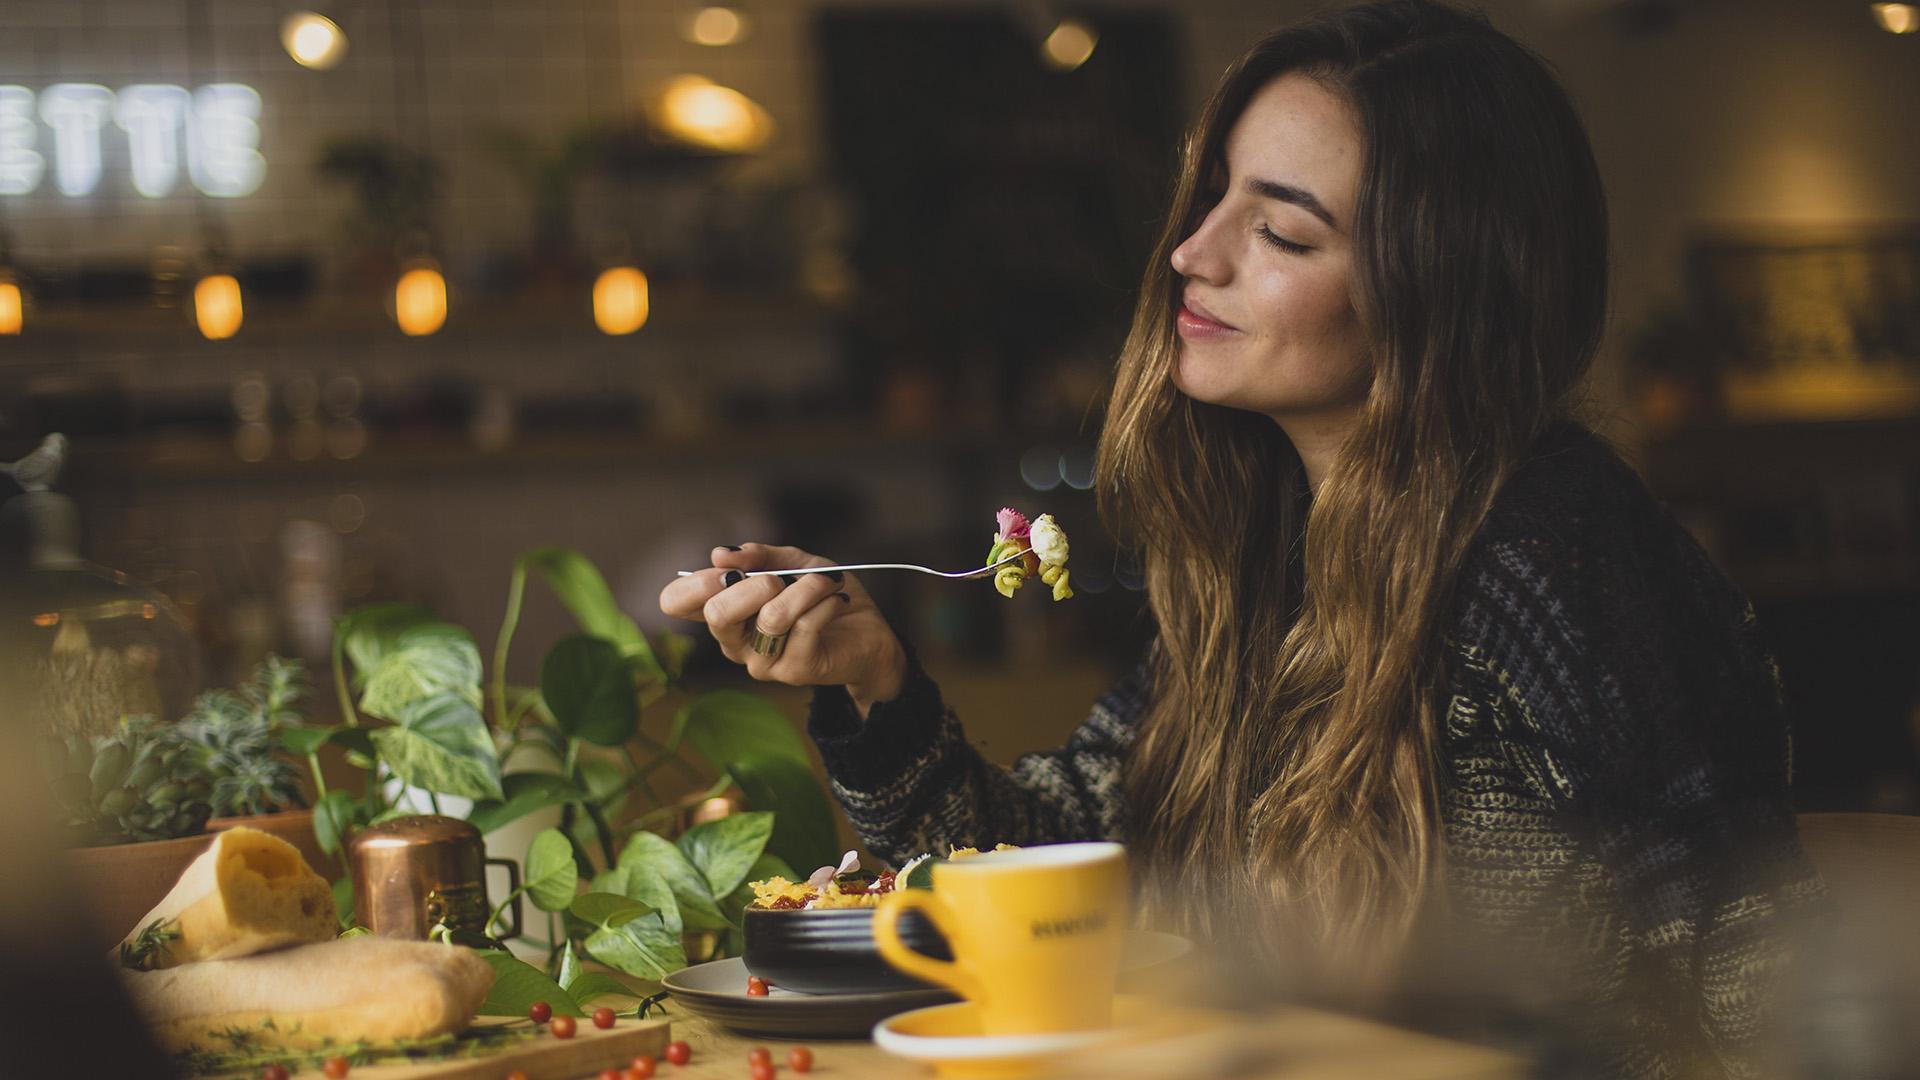 Eating For Hunger Or Pleasure? Regulating Feeding Behaviors Involves Different Brain Circuits